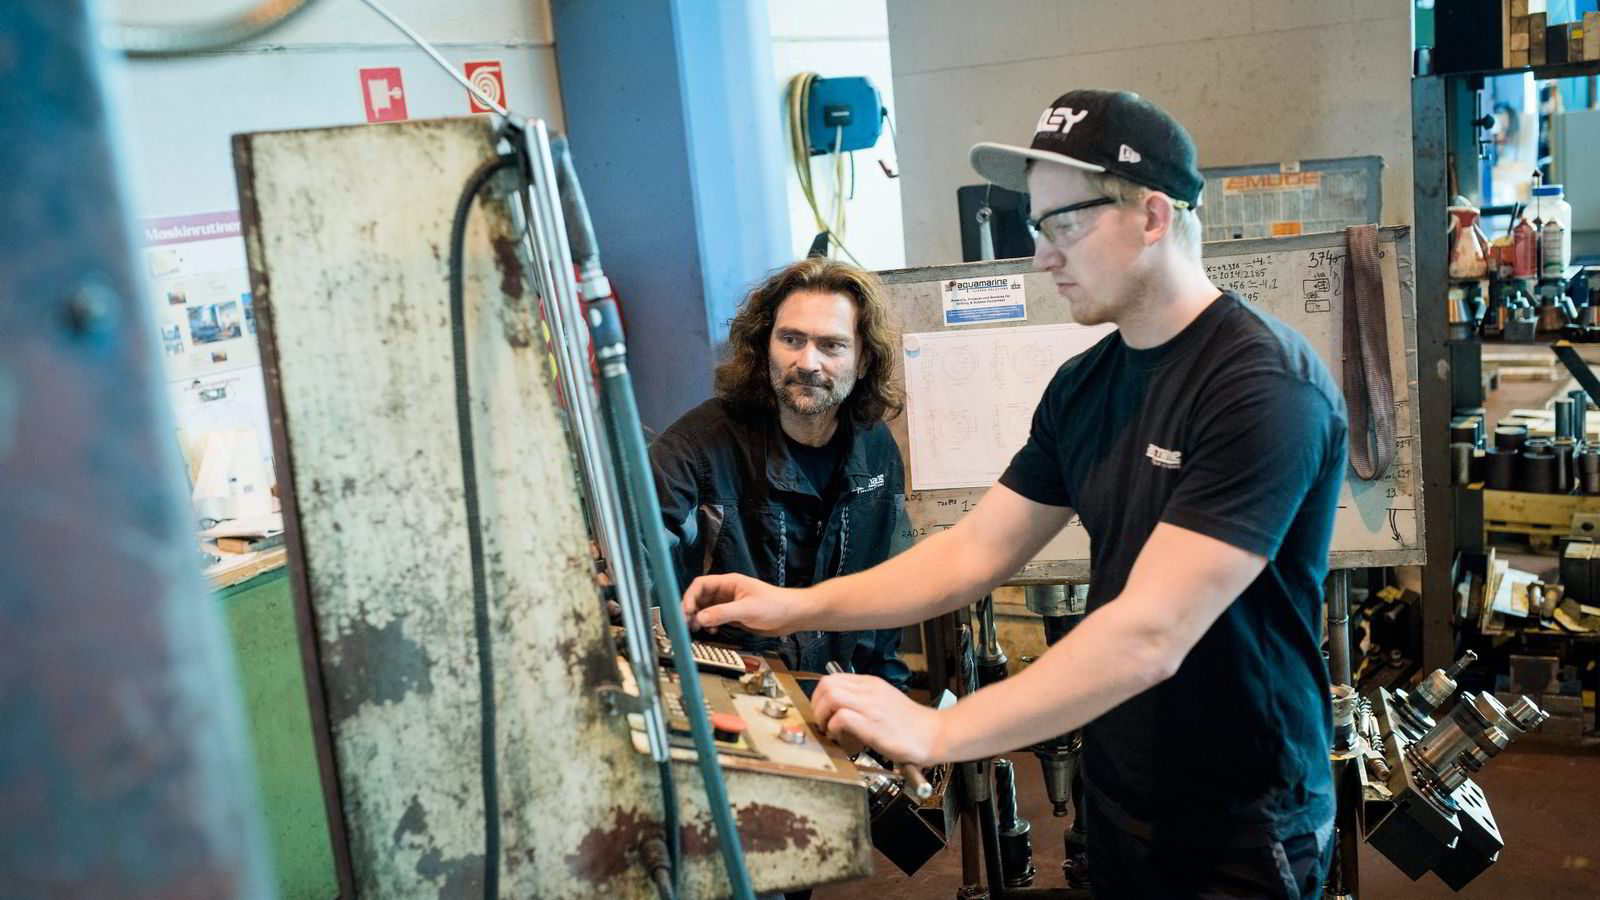 Operatør Fridtjof Holthe (til høyre) og klubbleder Ståle Borgerud på maskineringsverkstedet til Aquamarin Subsea i Vestby frykter morgendagen.